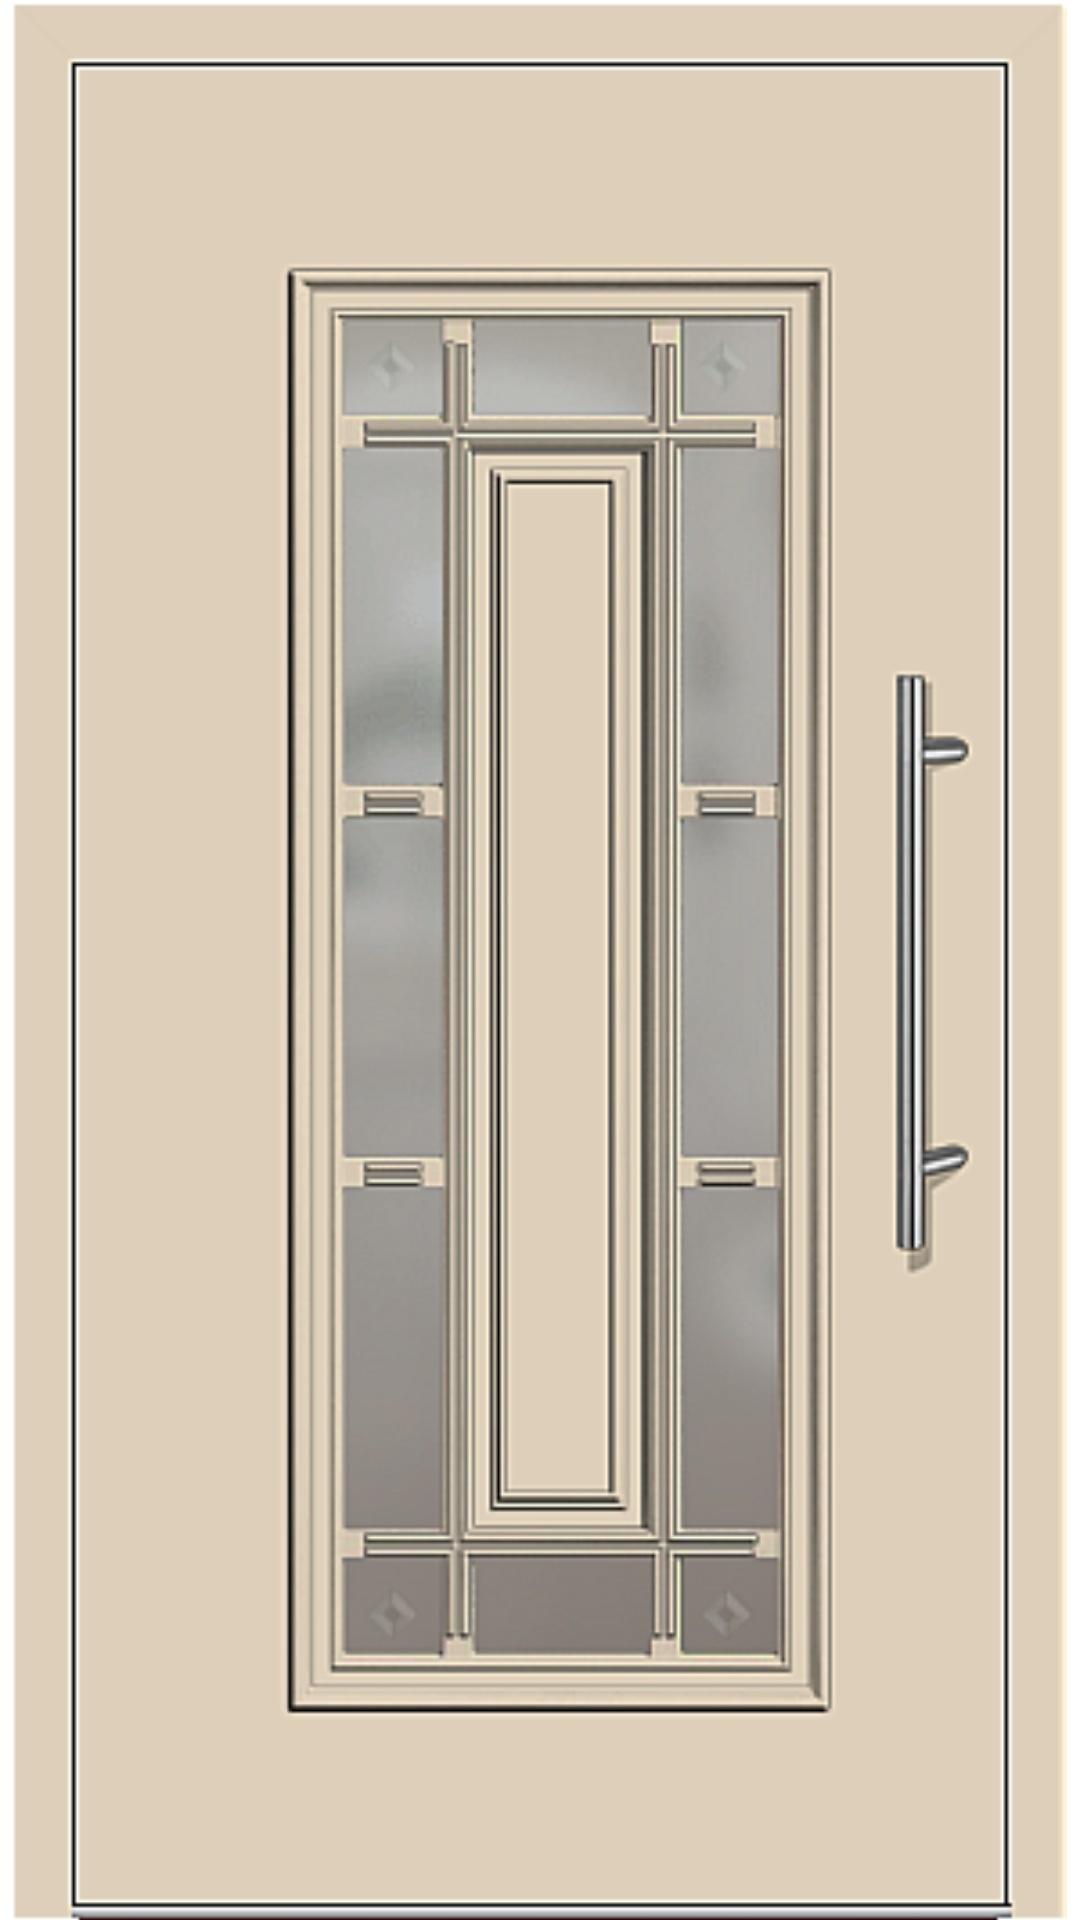 Aluminium Haustür Modell 4150-11 beige